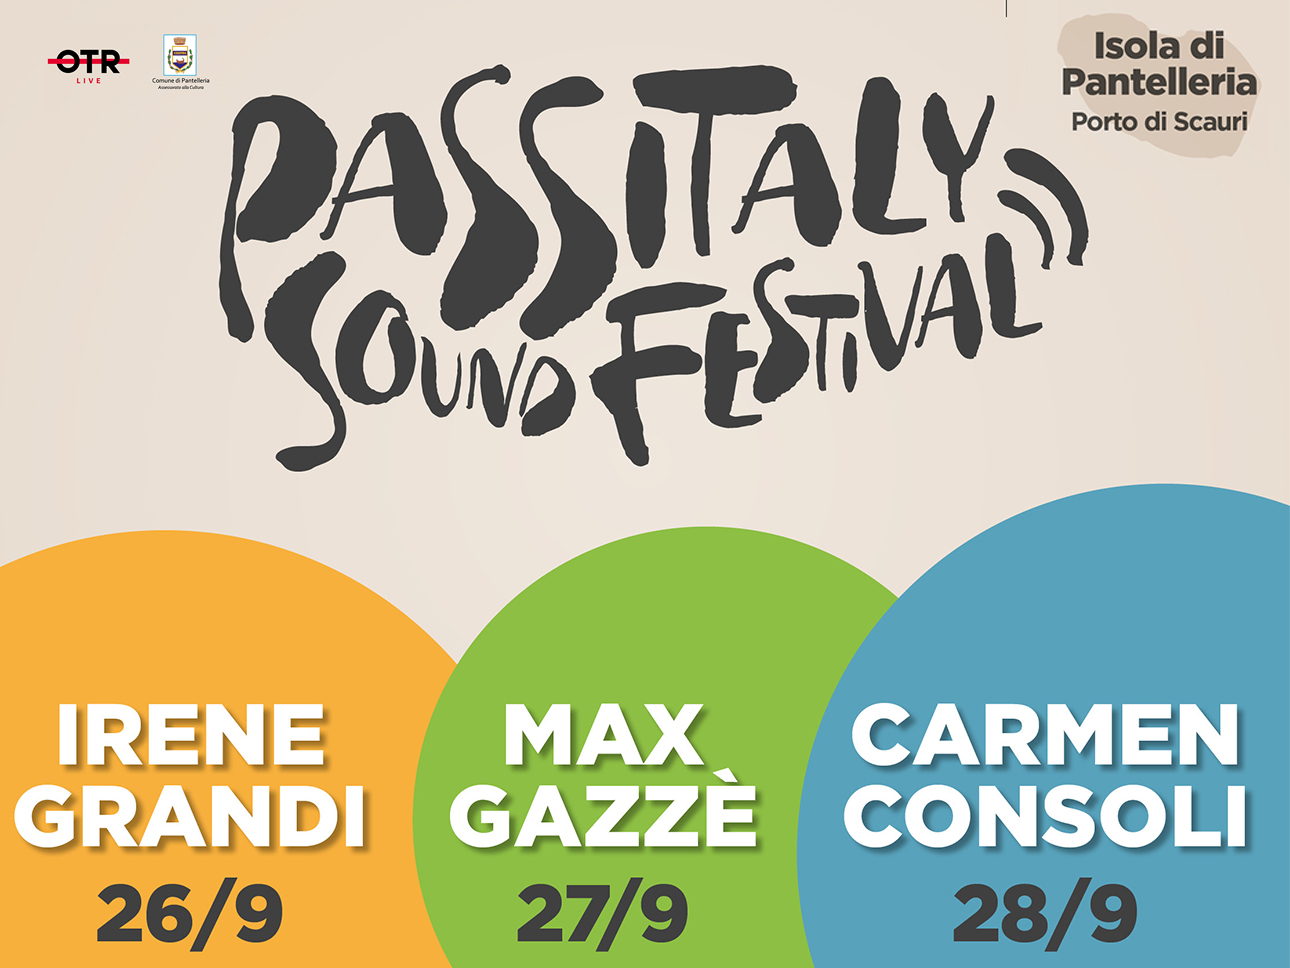 Passitaly-2019-Pantelleria